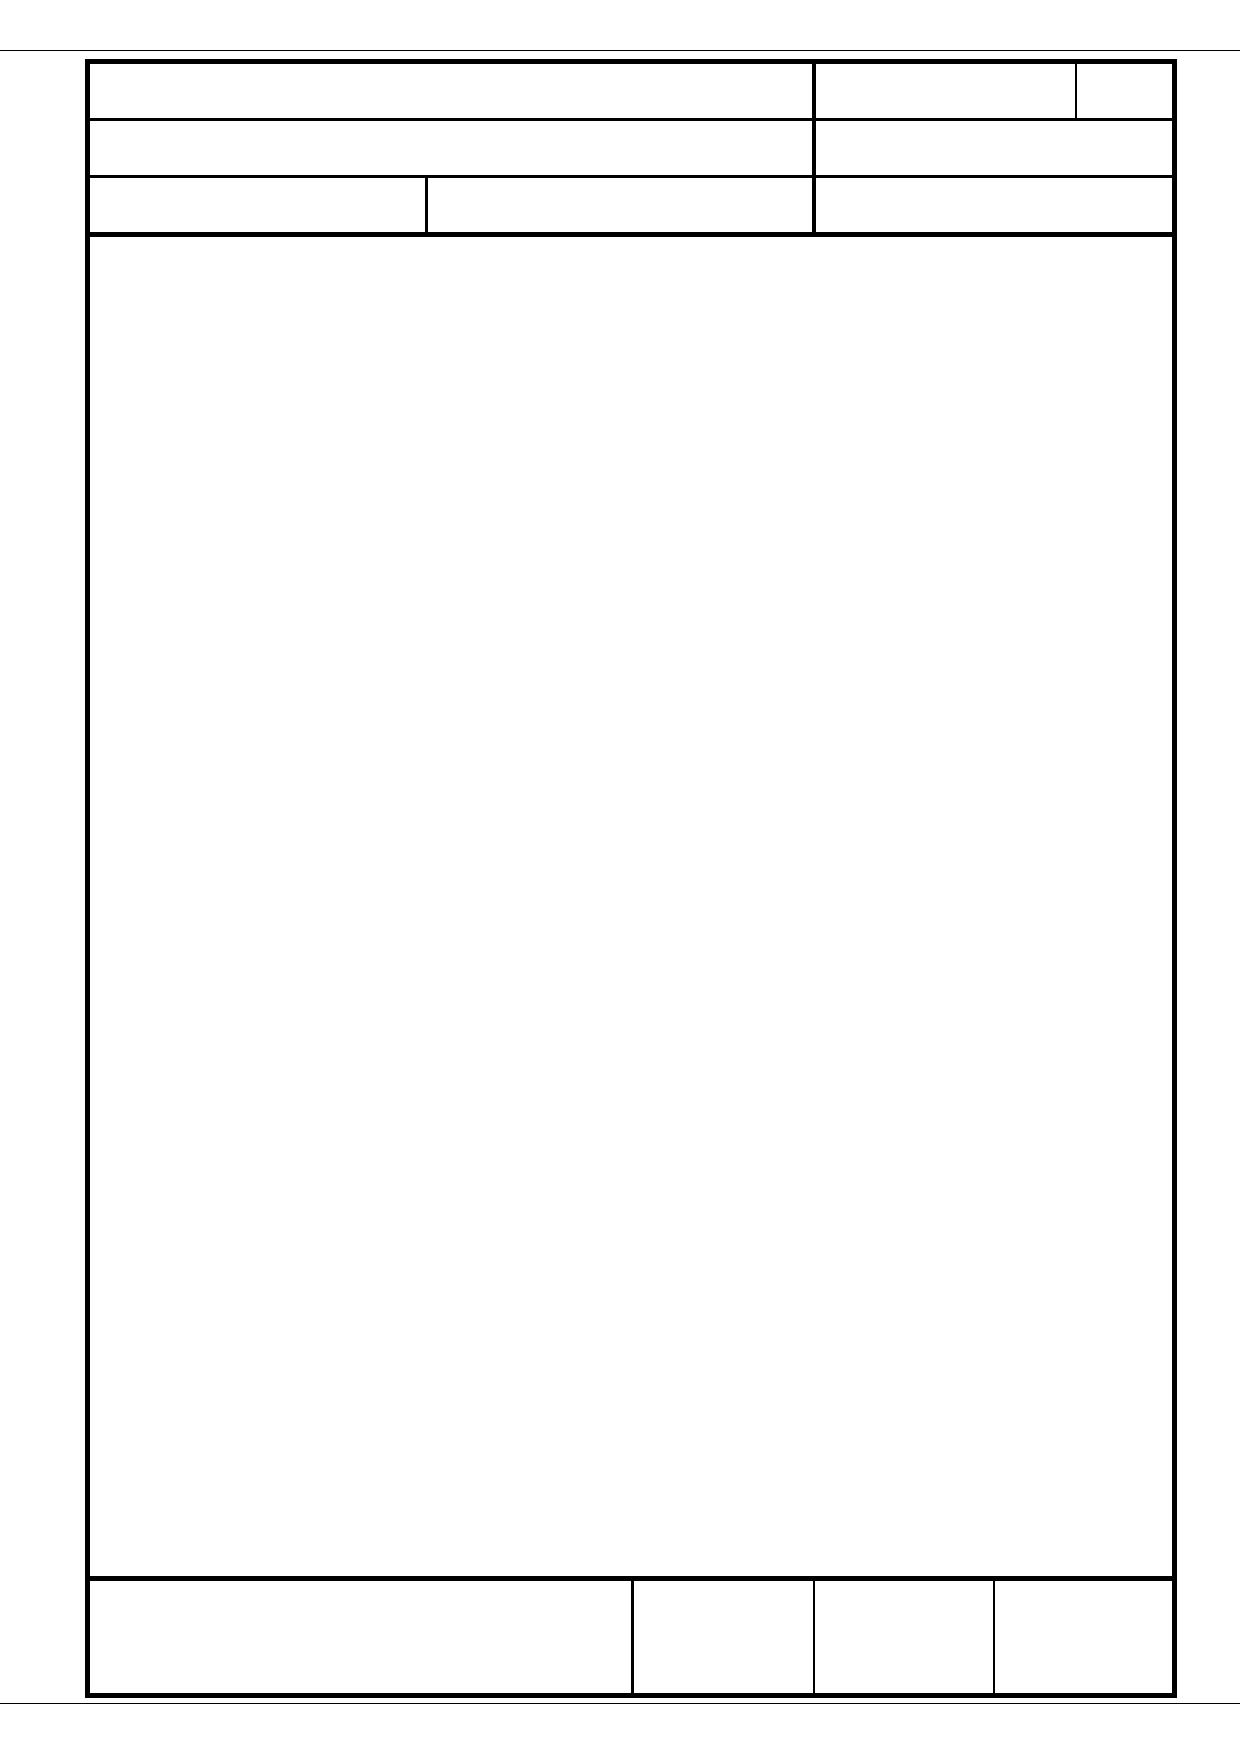 PAN1315B دیتاشیت PDF